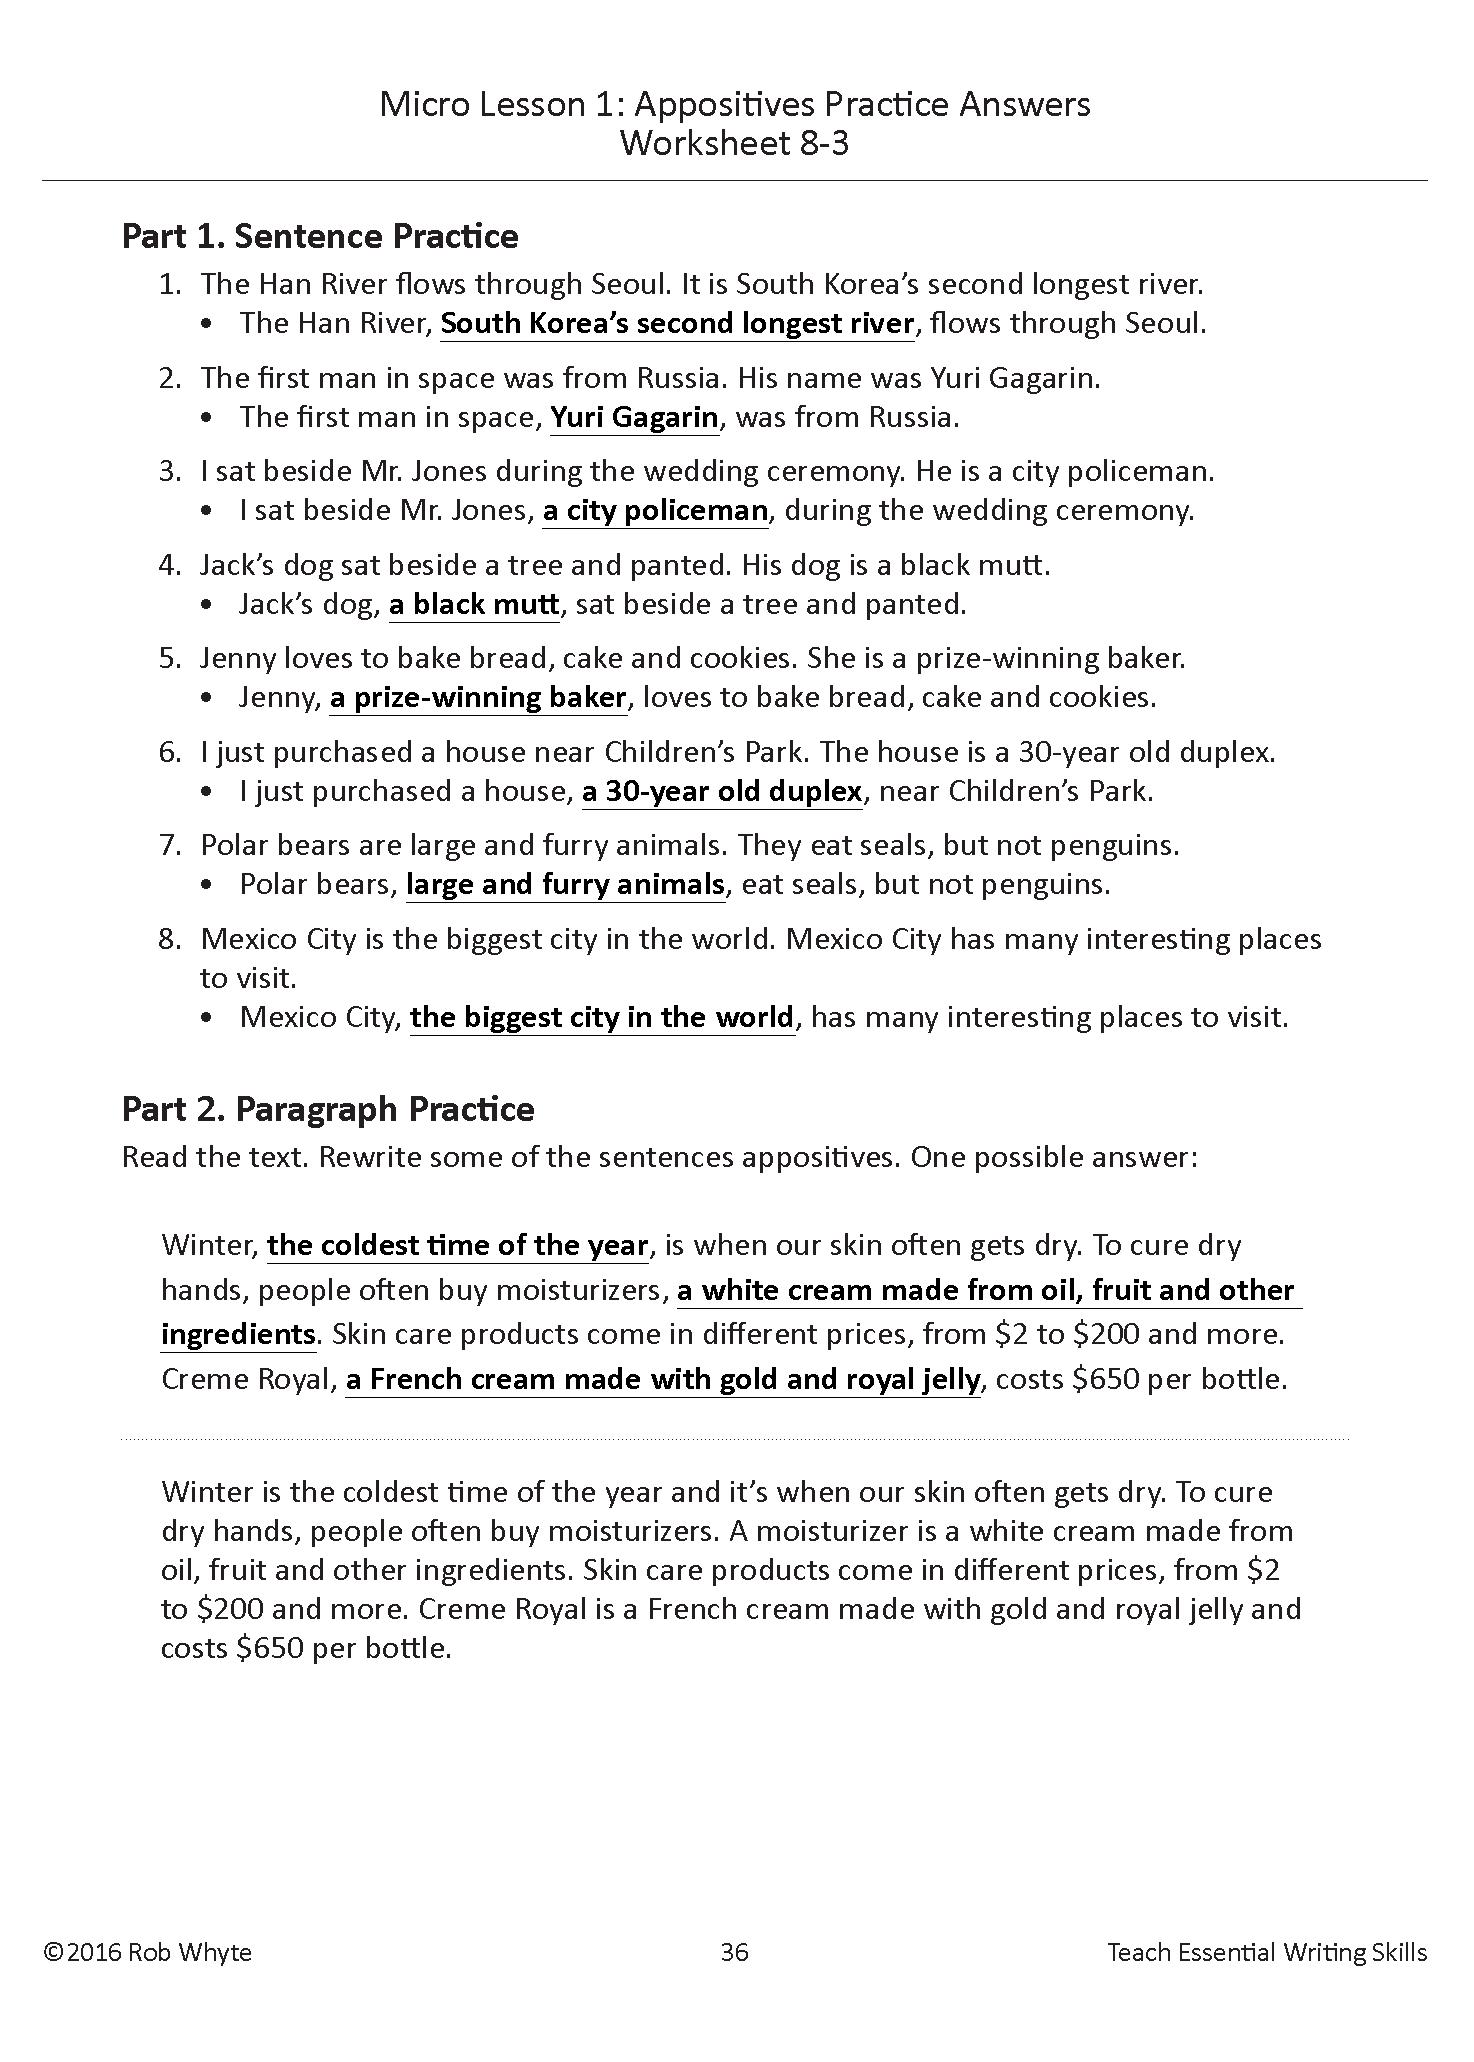 worksheet Appositive Practice Worksheet appositive 3 eslwriting org 3